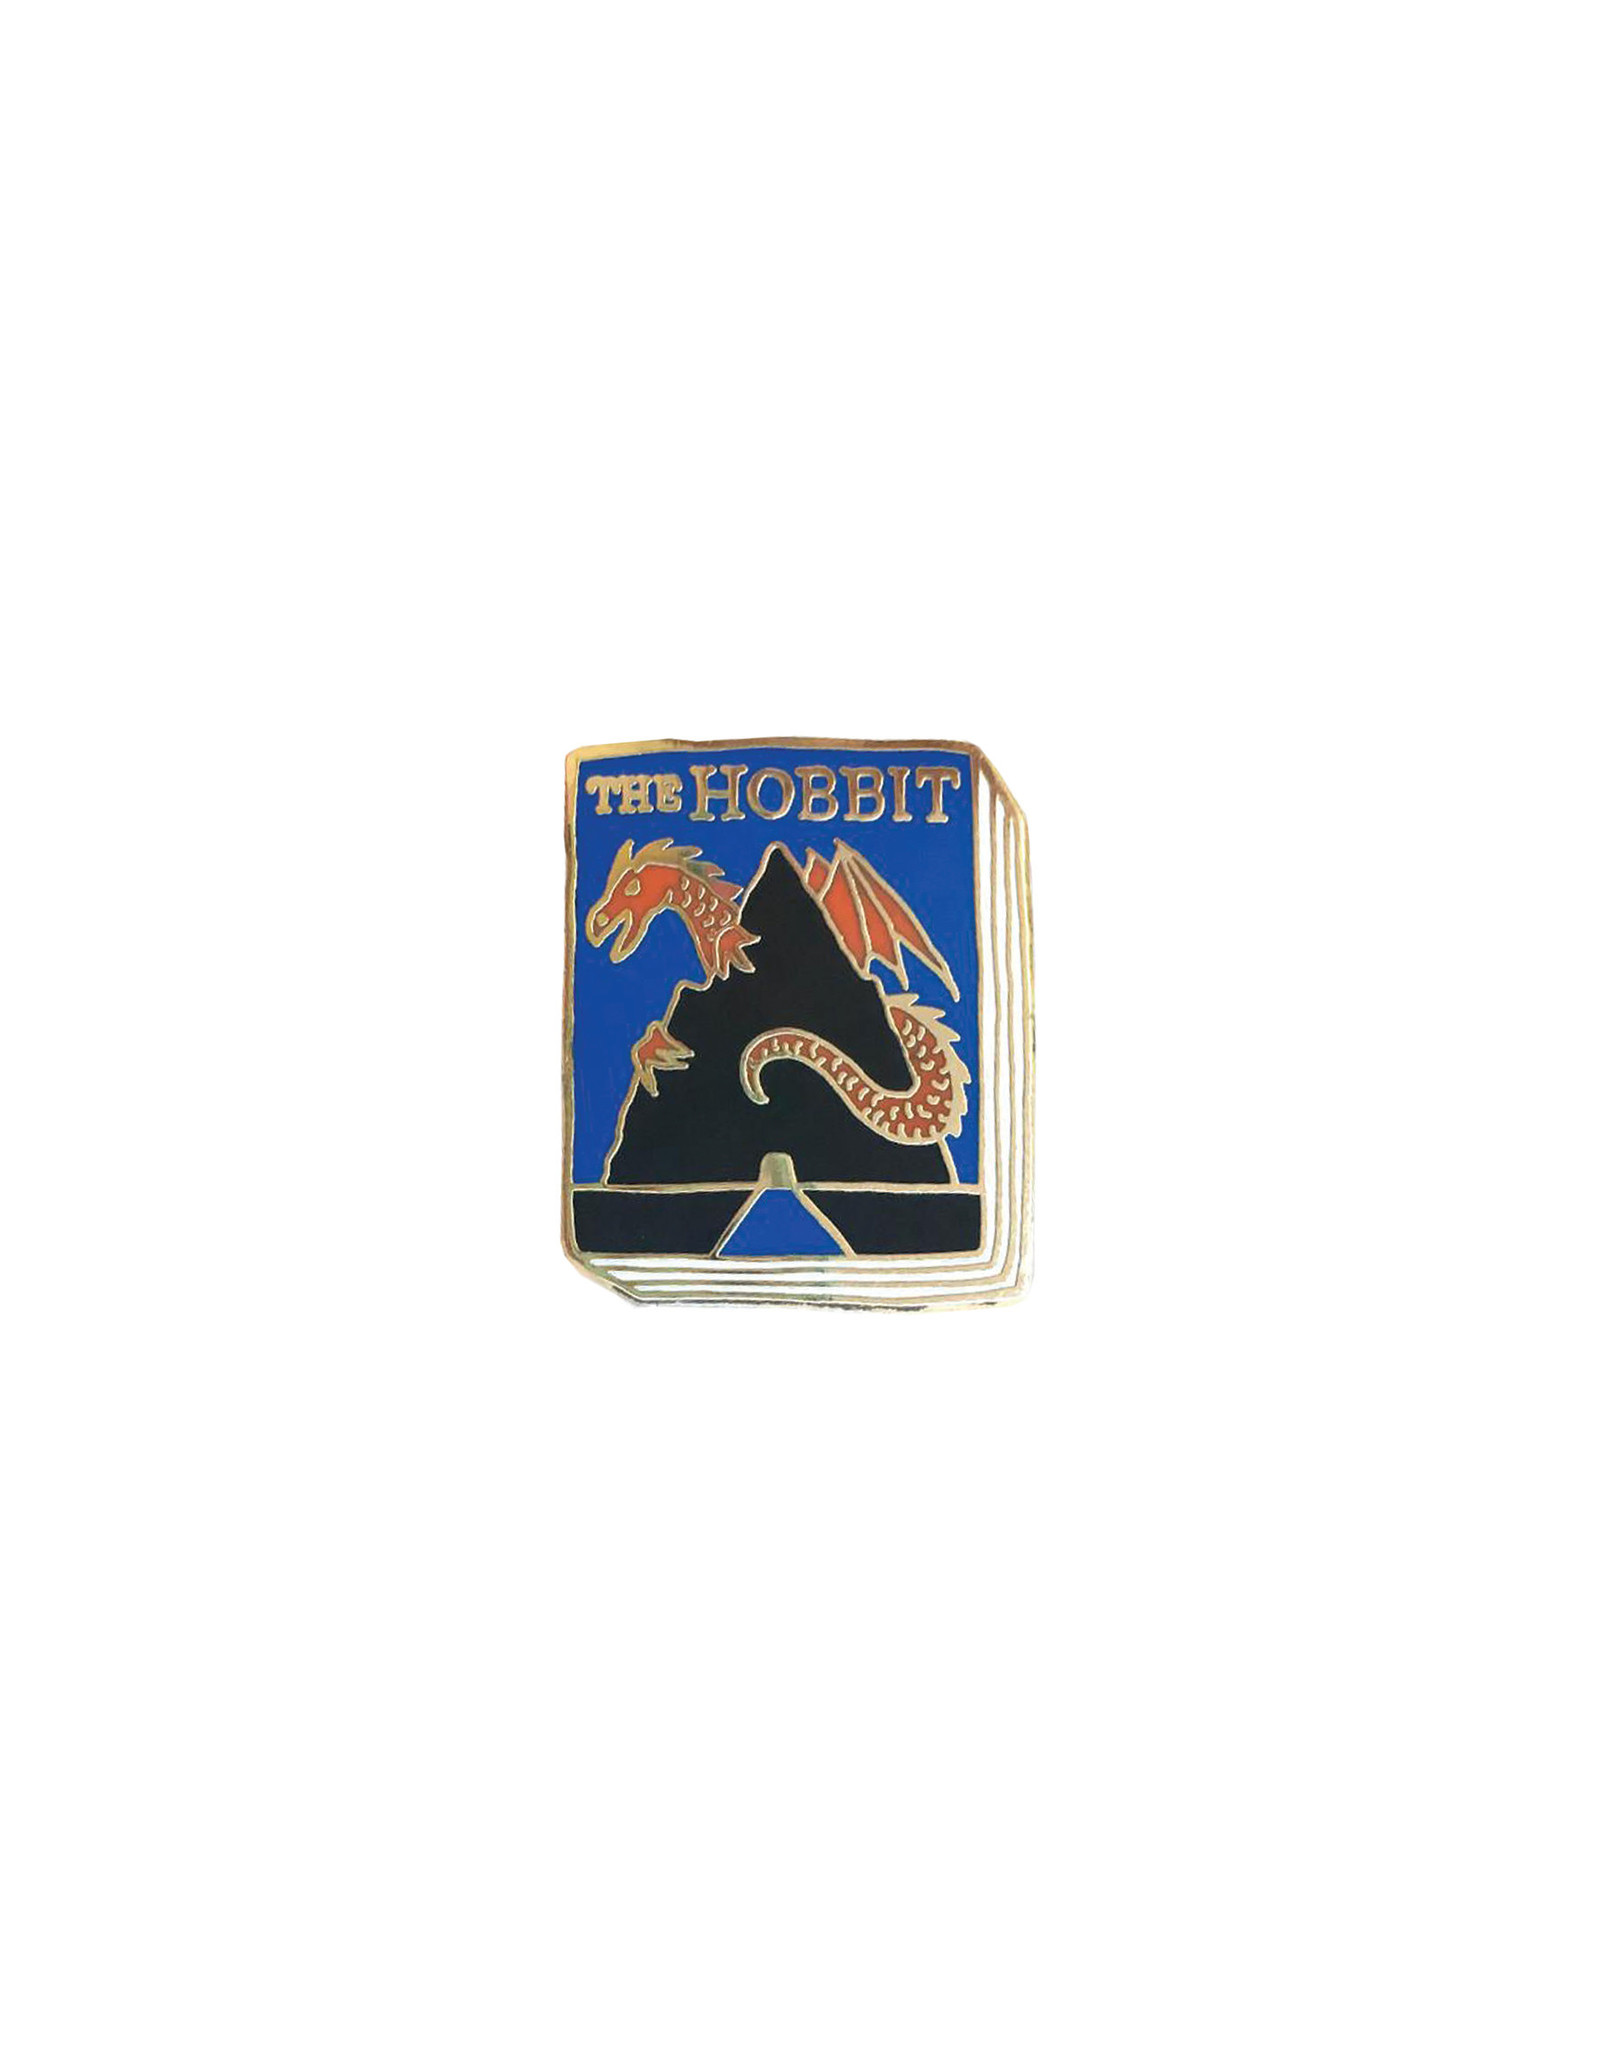 Ideal Bookshelf Book Pin: The Hobbit